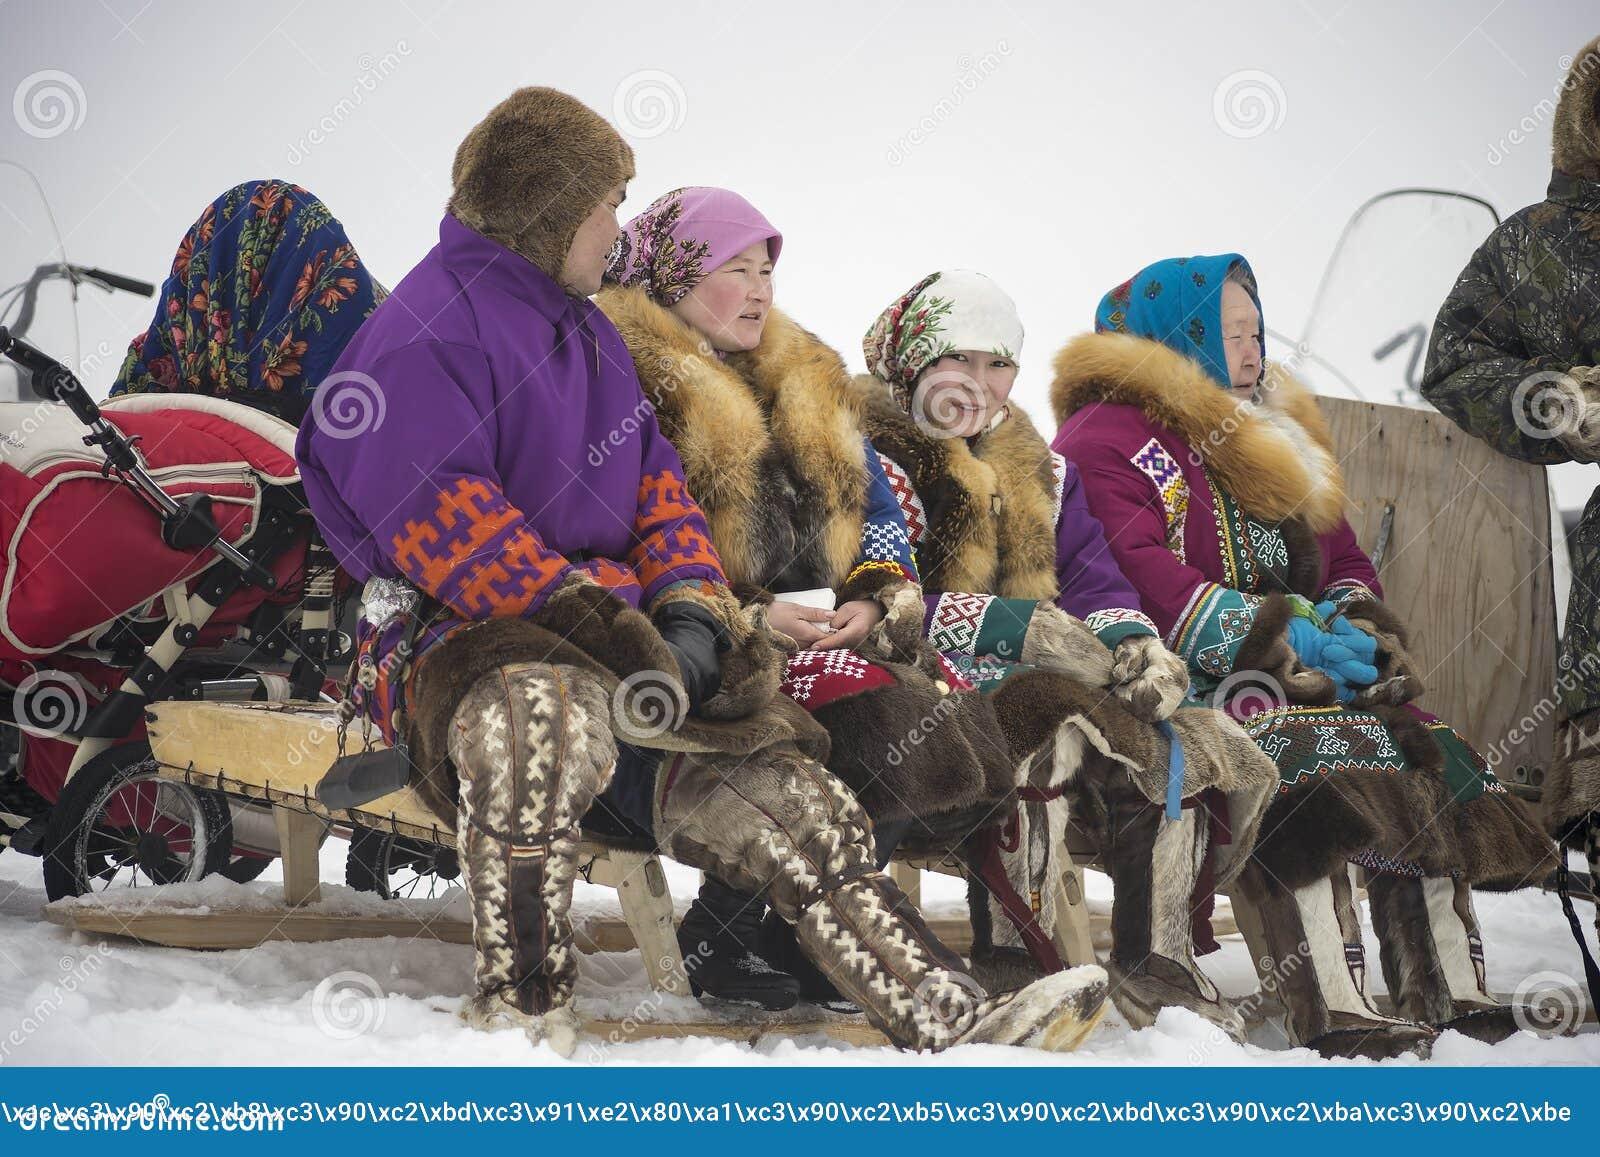 Download 家庭Khanty坐雪撬 编辑类库存图片. 图片 包括有 模式, 衣物, 手表, 全部赌注, 跳接器, 服装 - 50682499